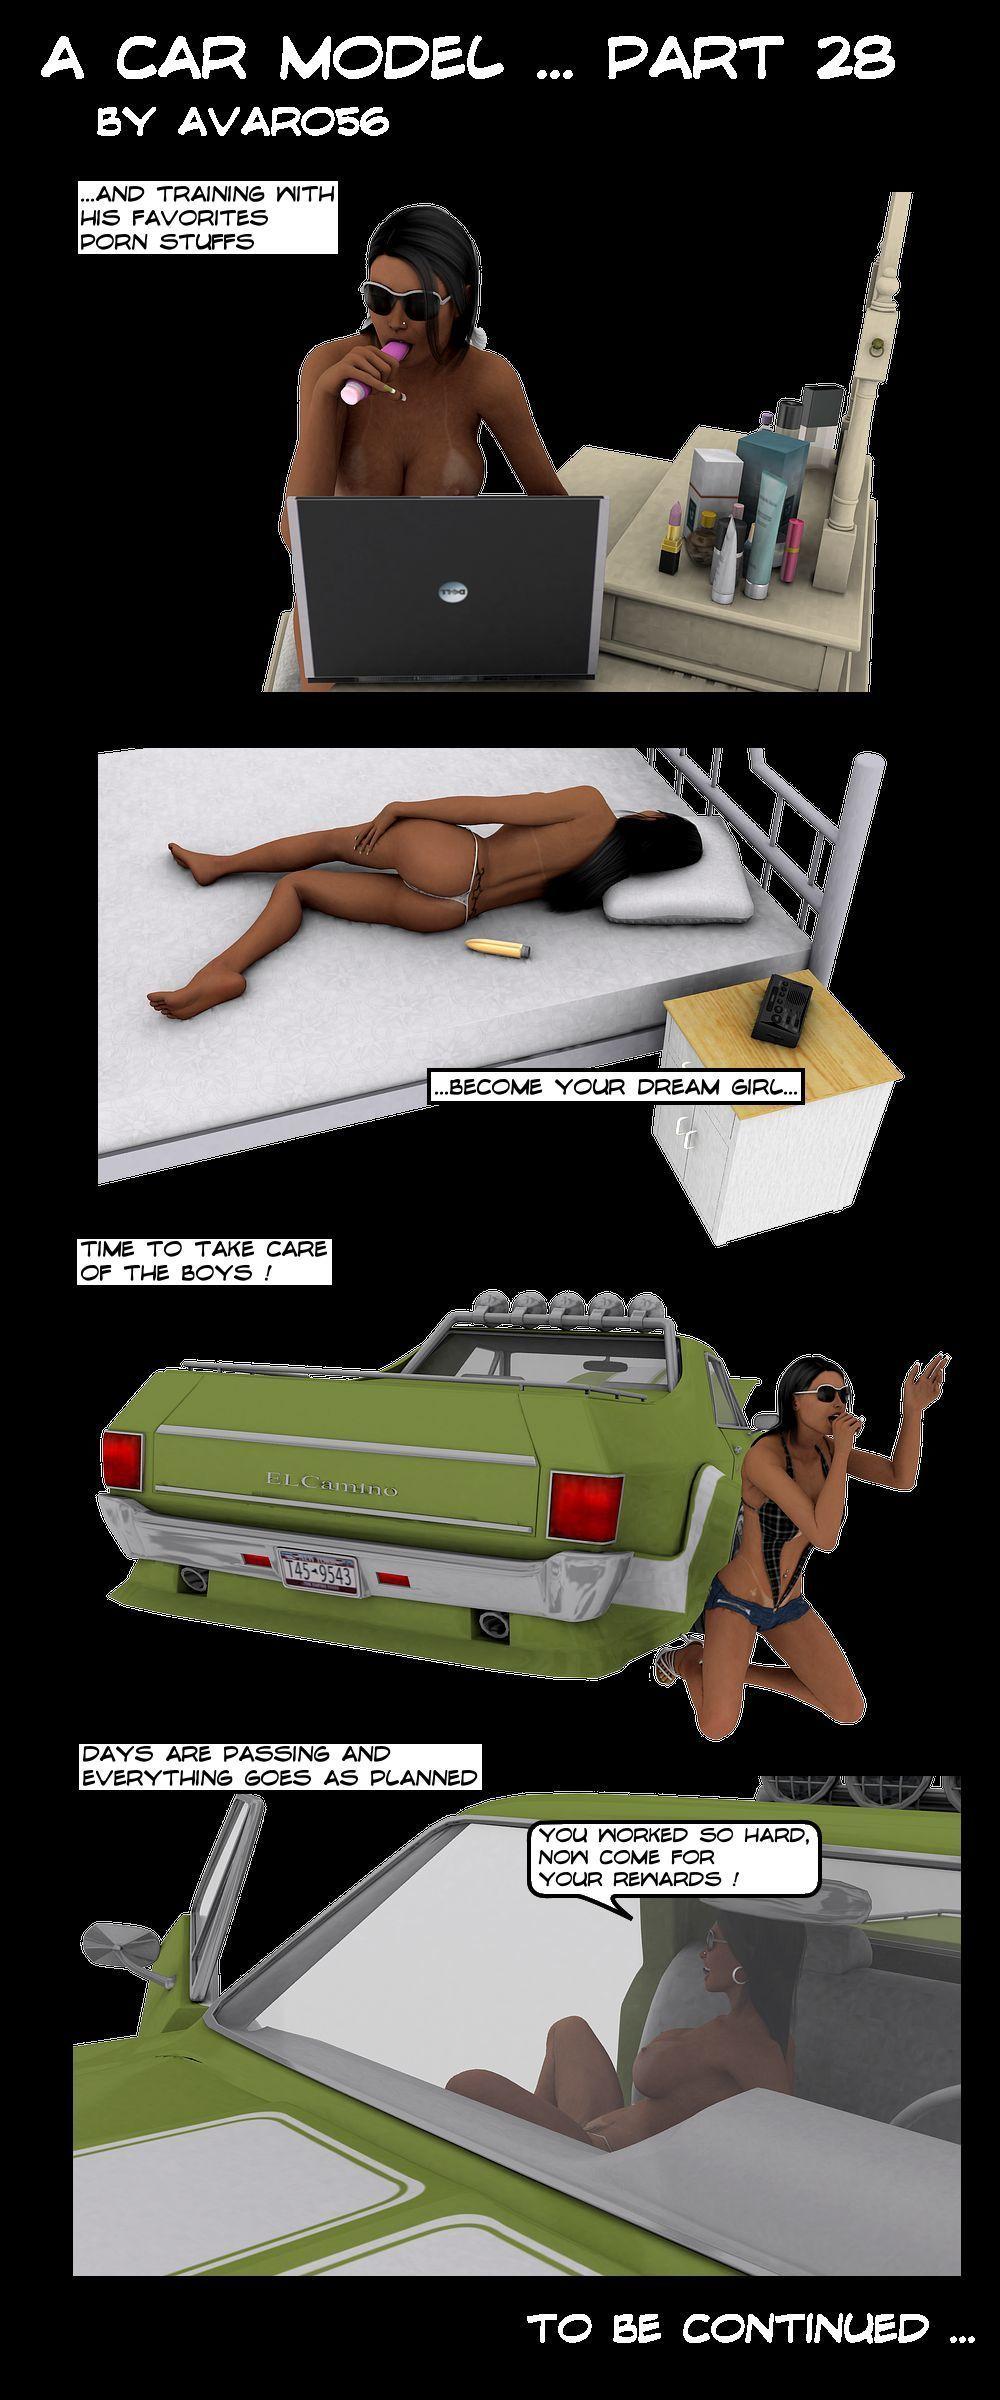 [Avaro56] A Car Model - part 2